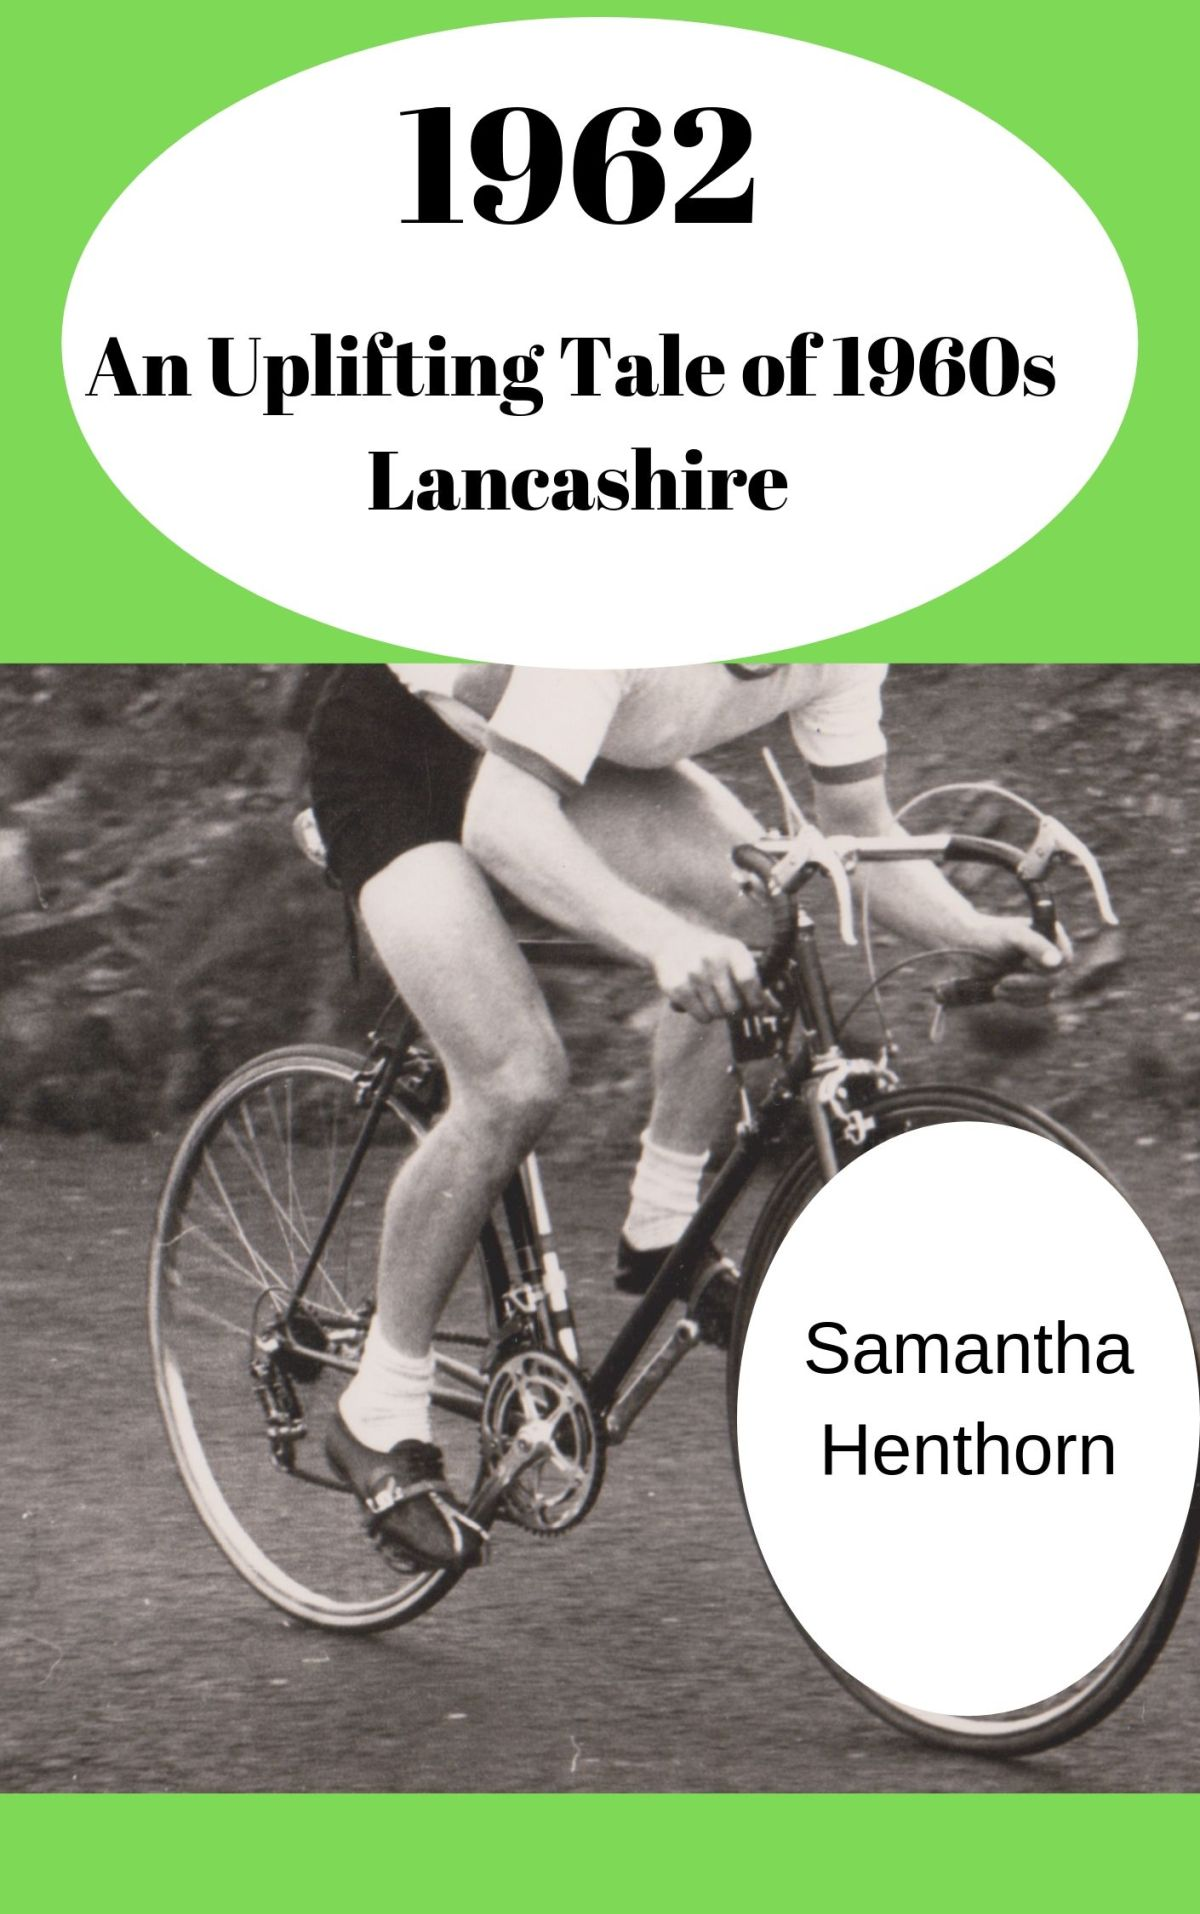 1962 (An Uplifting Tale of 1960sLancashire)